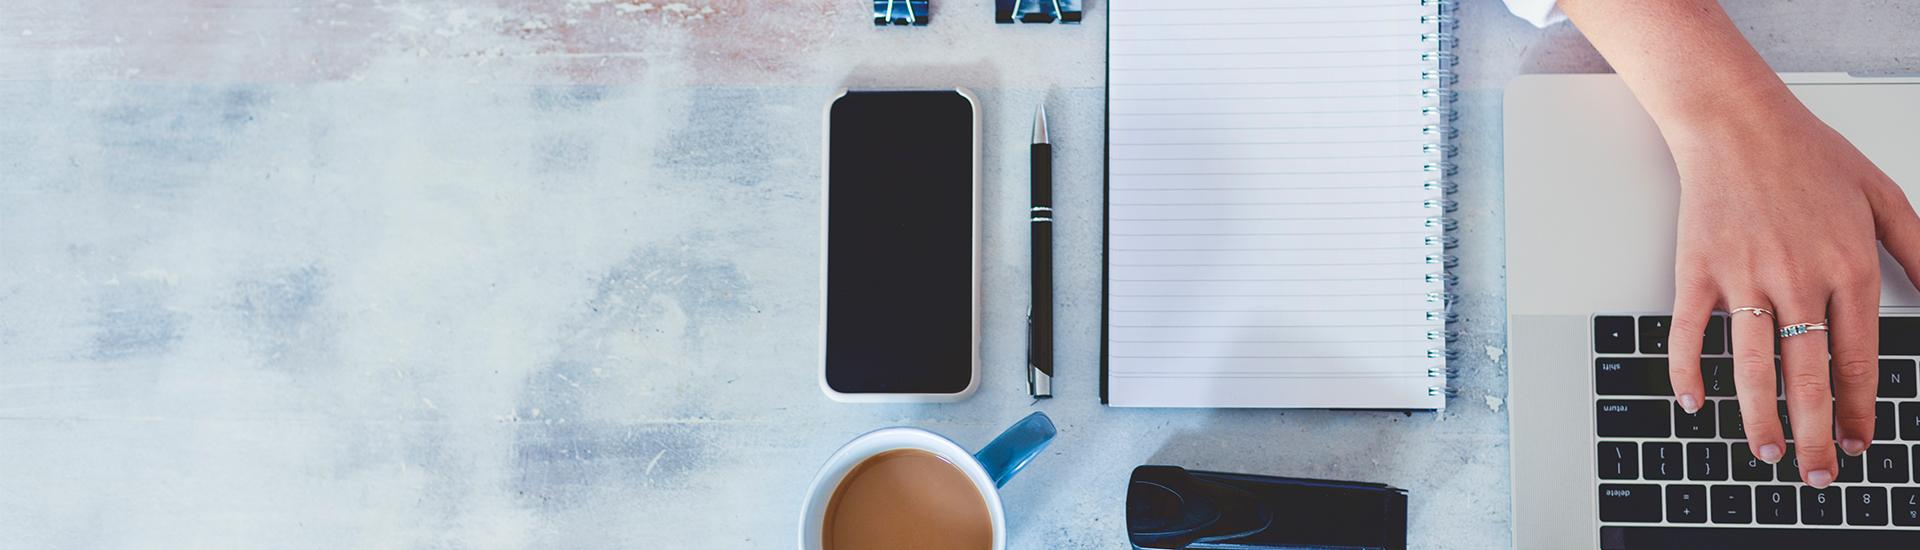 Vye-Blog-_0006_2018's Most Insightful Email Marketing Statistics